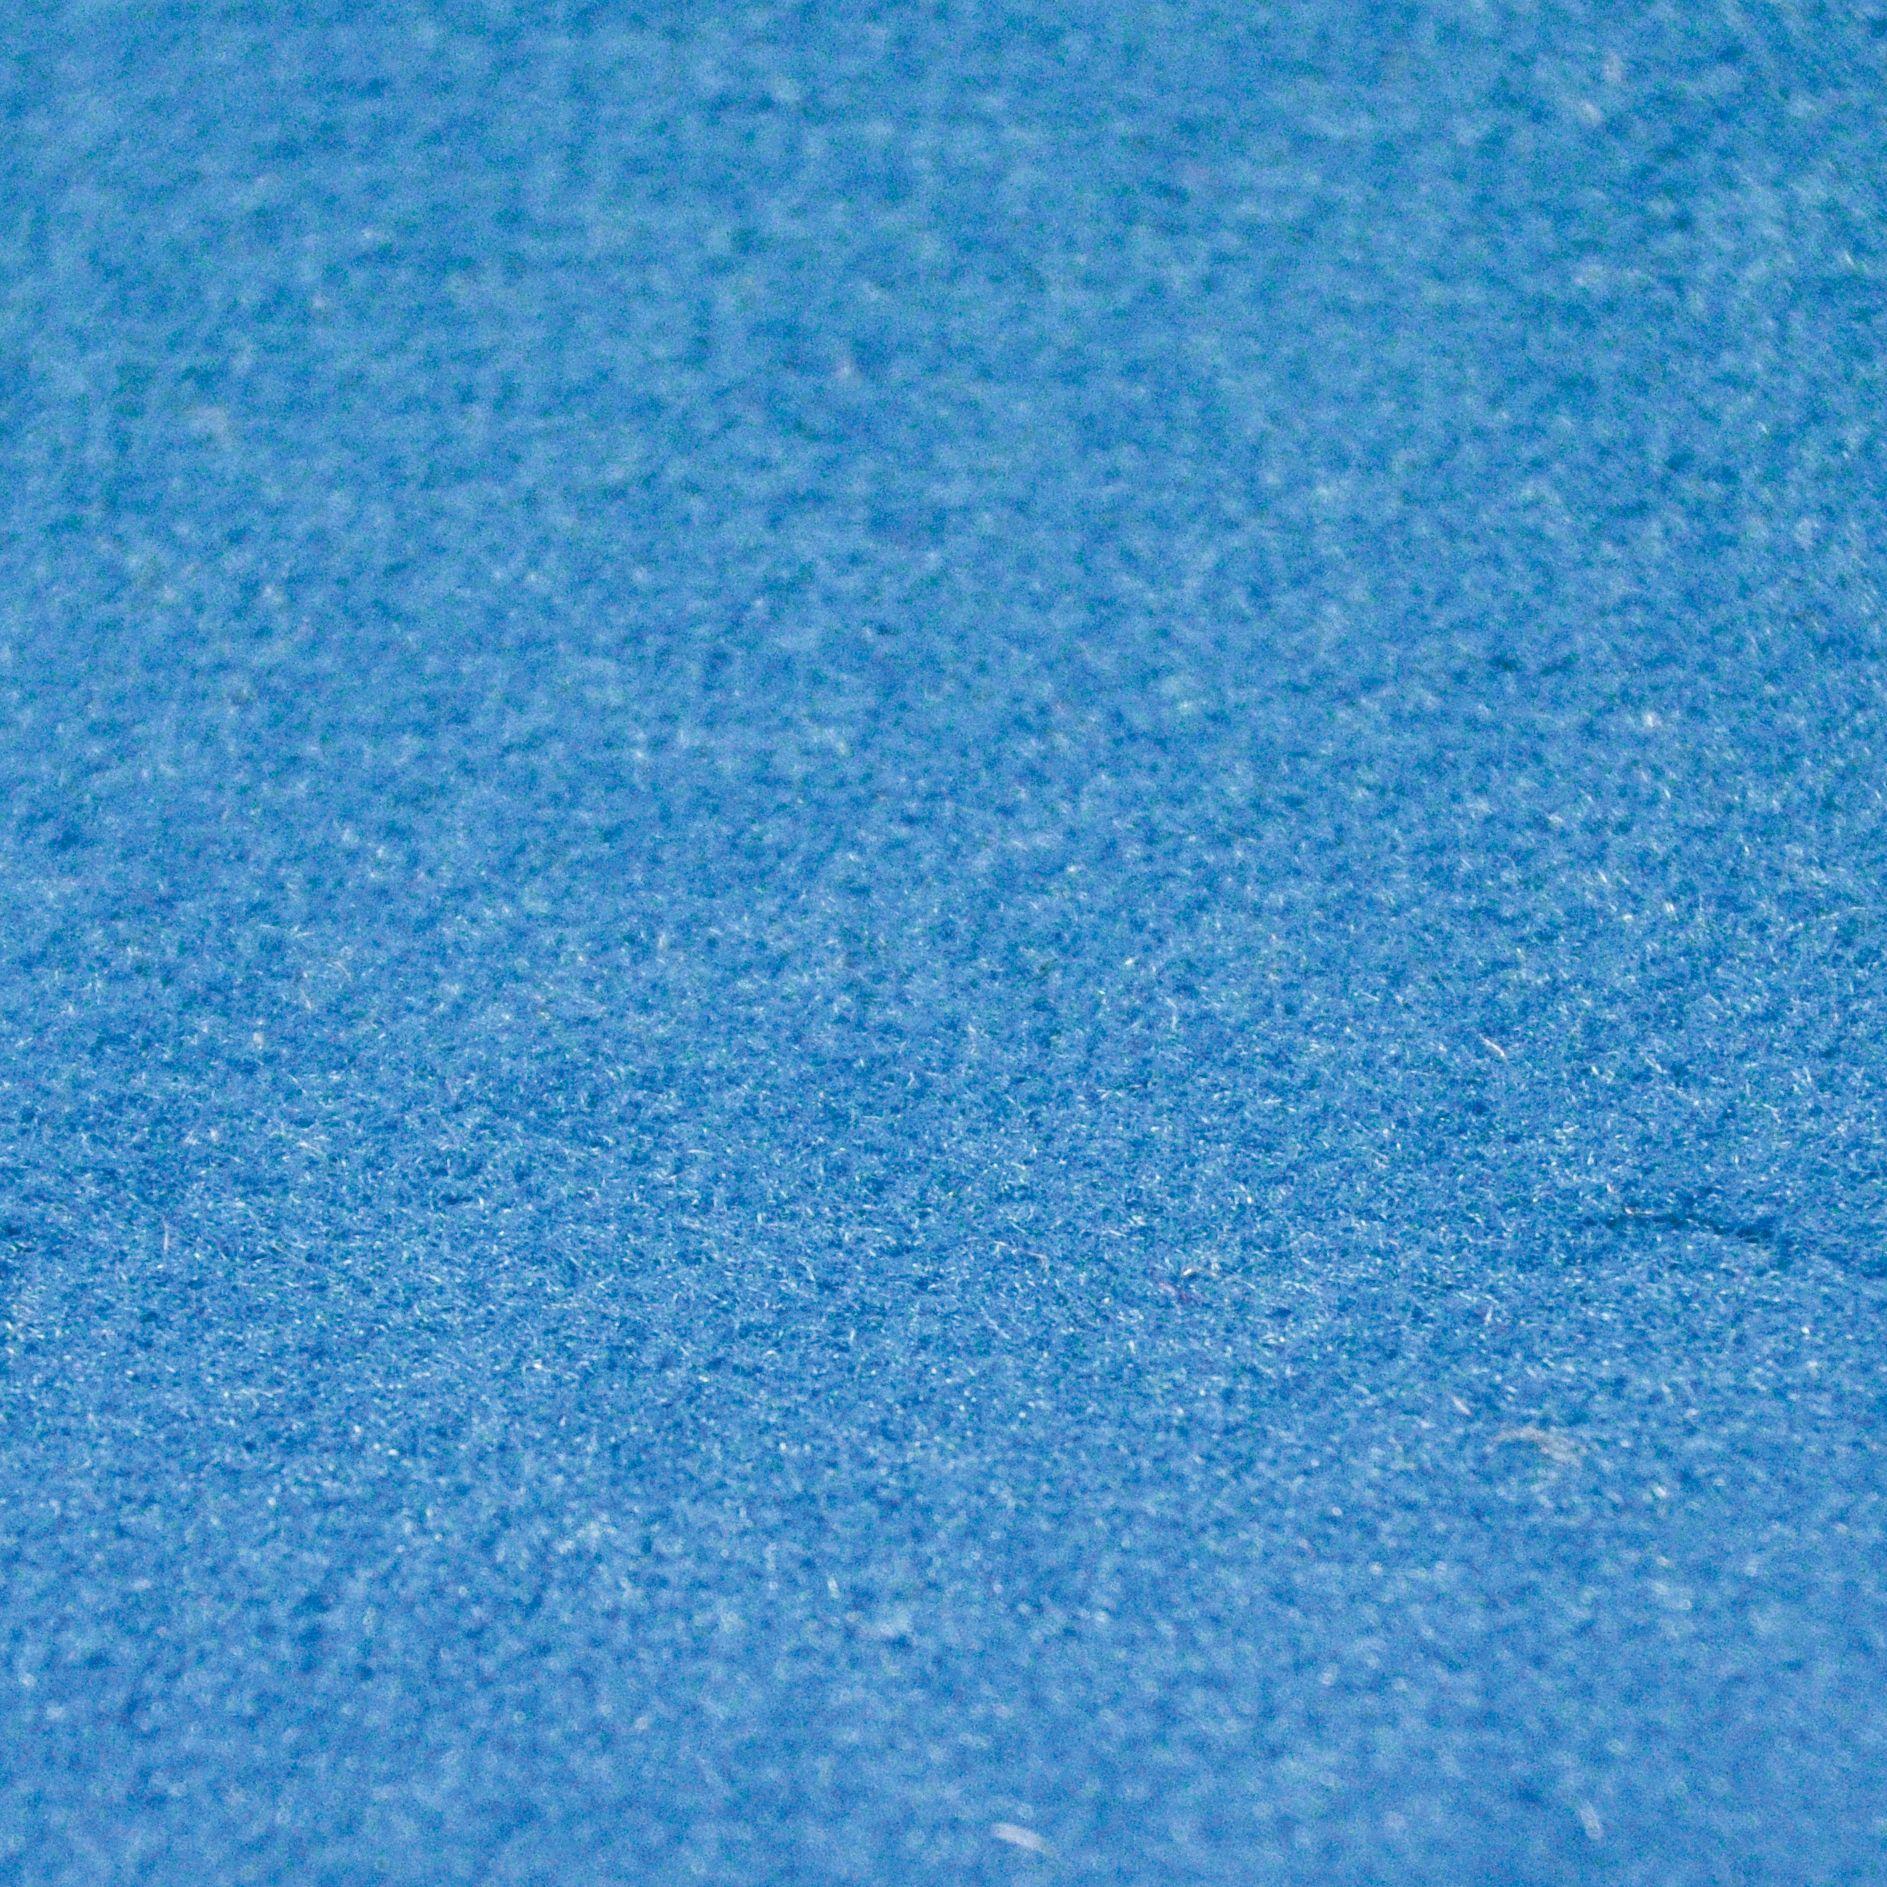 Teppich 2 x 3 m